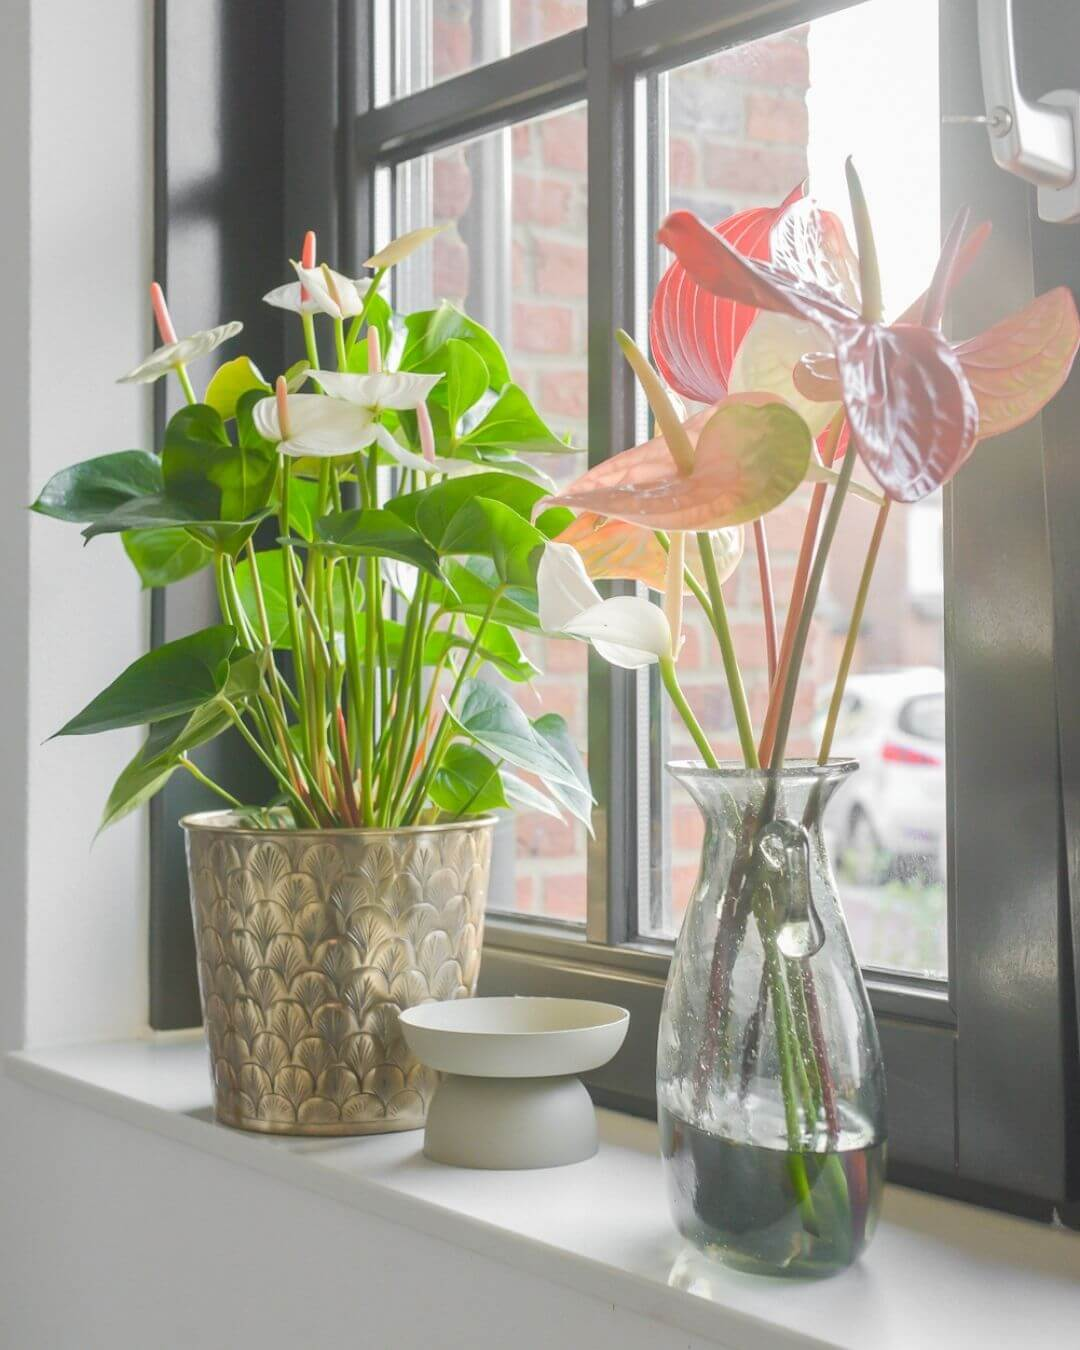 Zo gebruikt Binti Home anthuriums in haar interieur